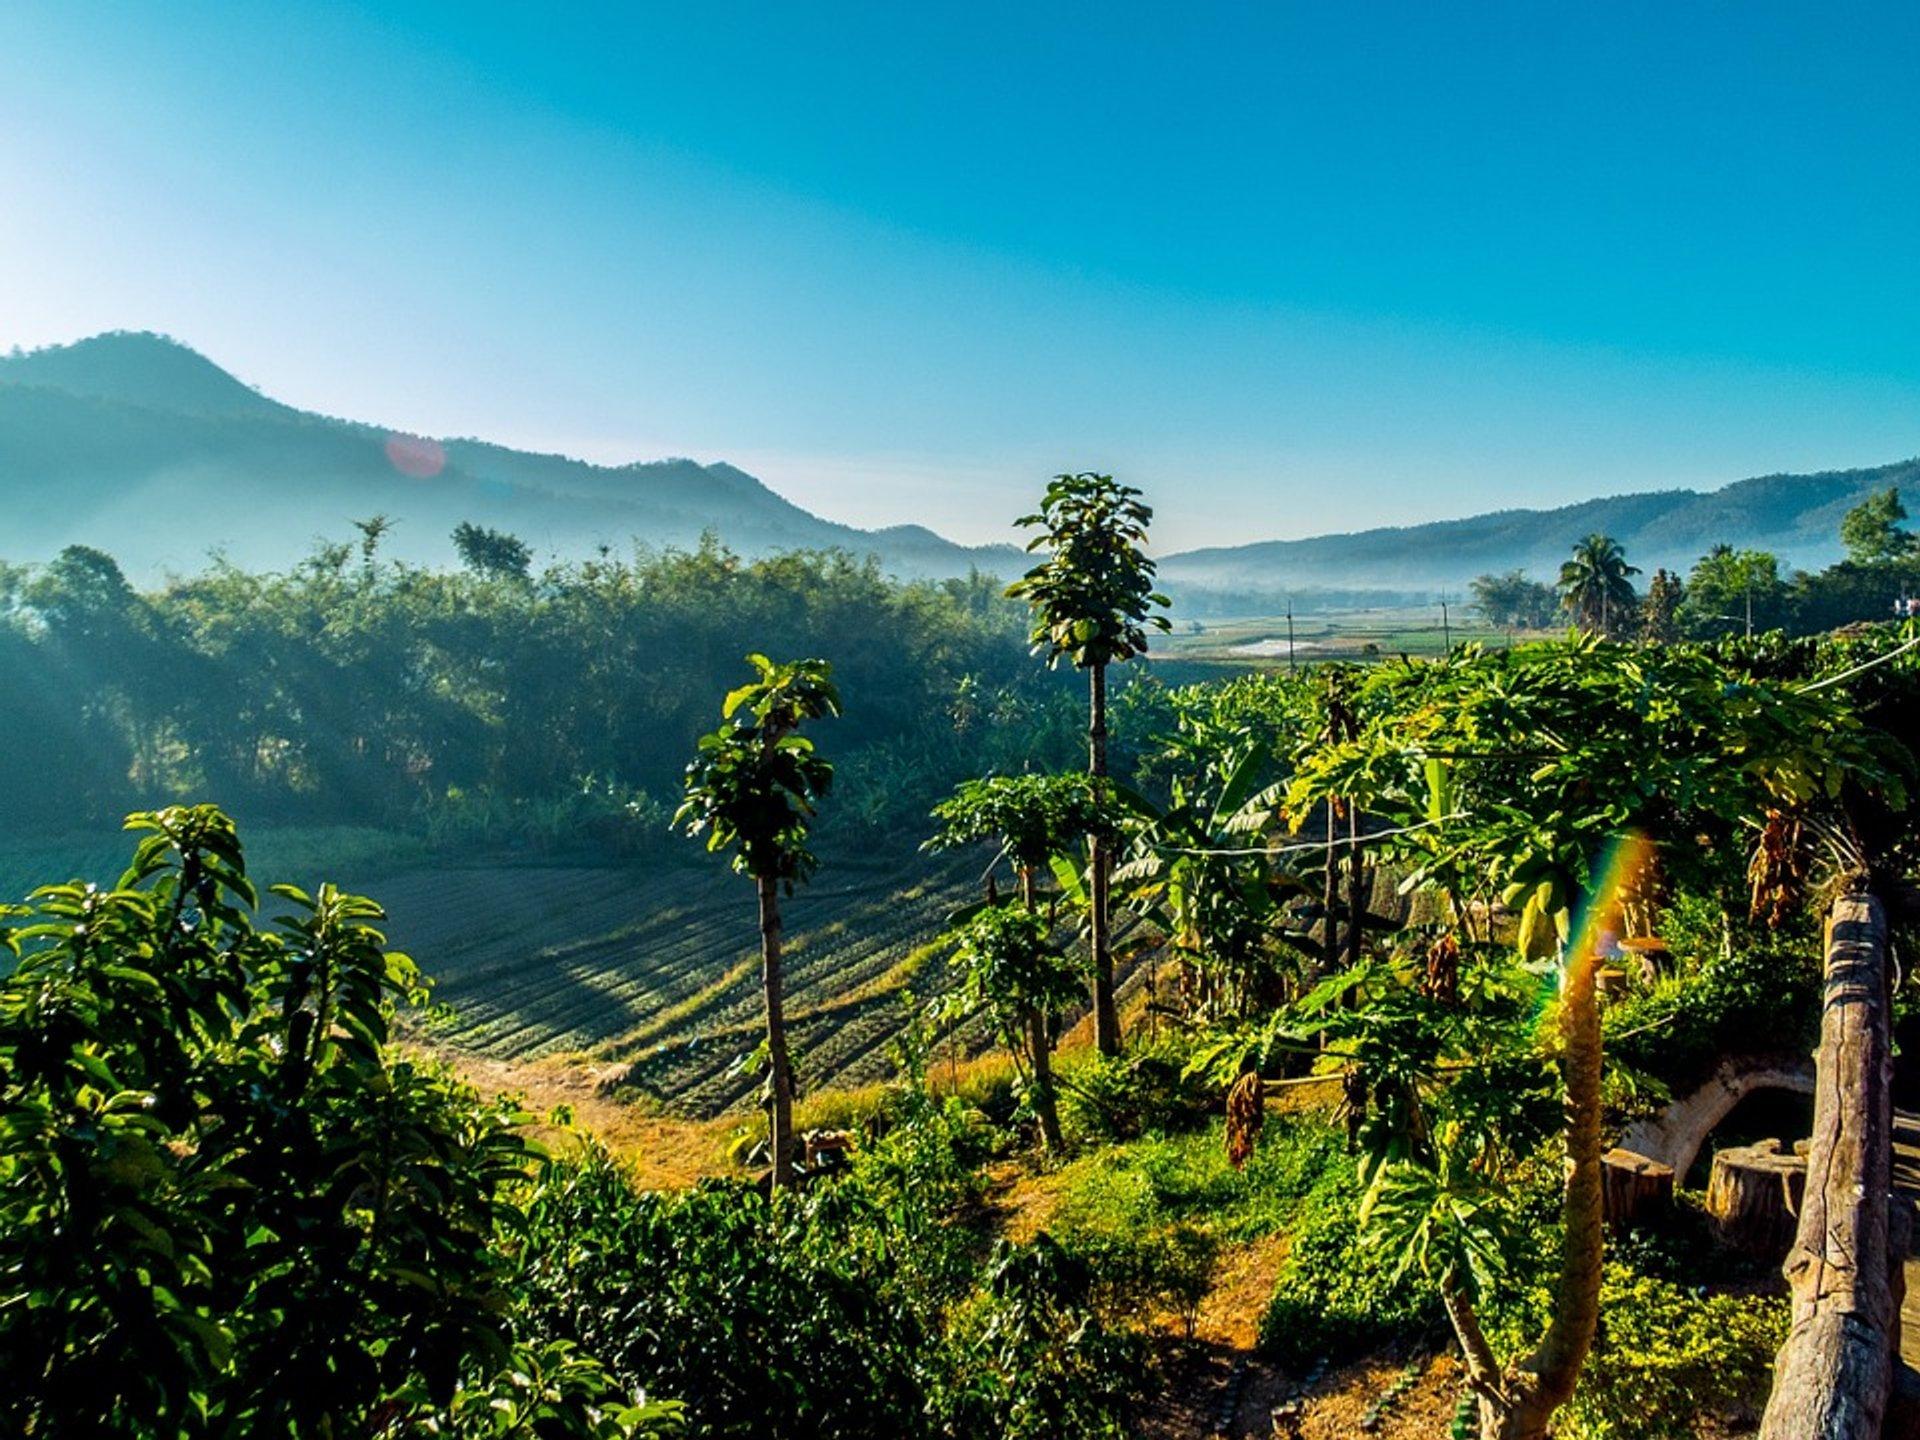 Hot Season (Summer) in Thailand 2020 - Best Time